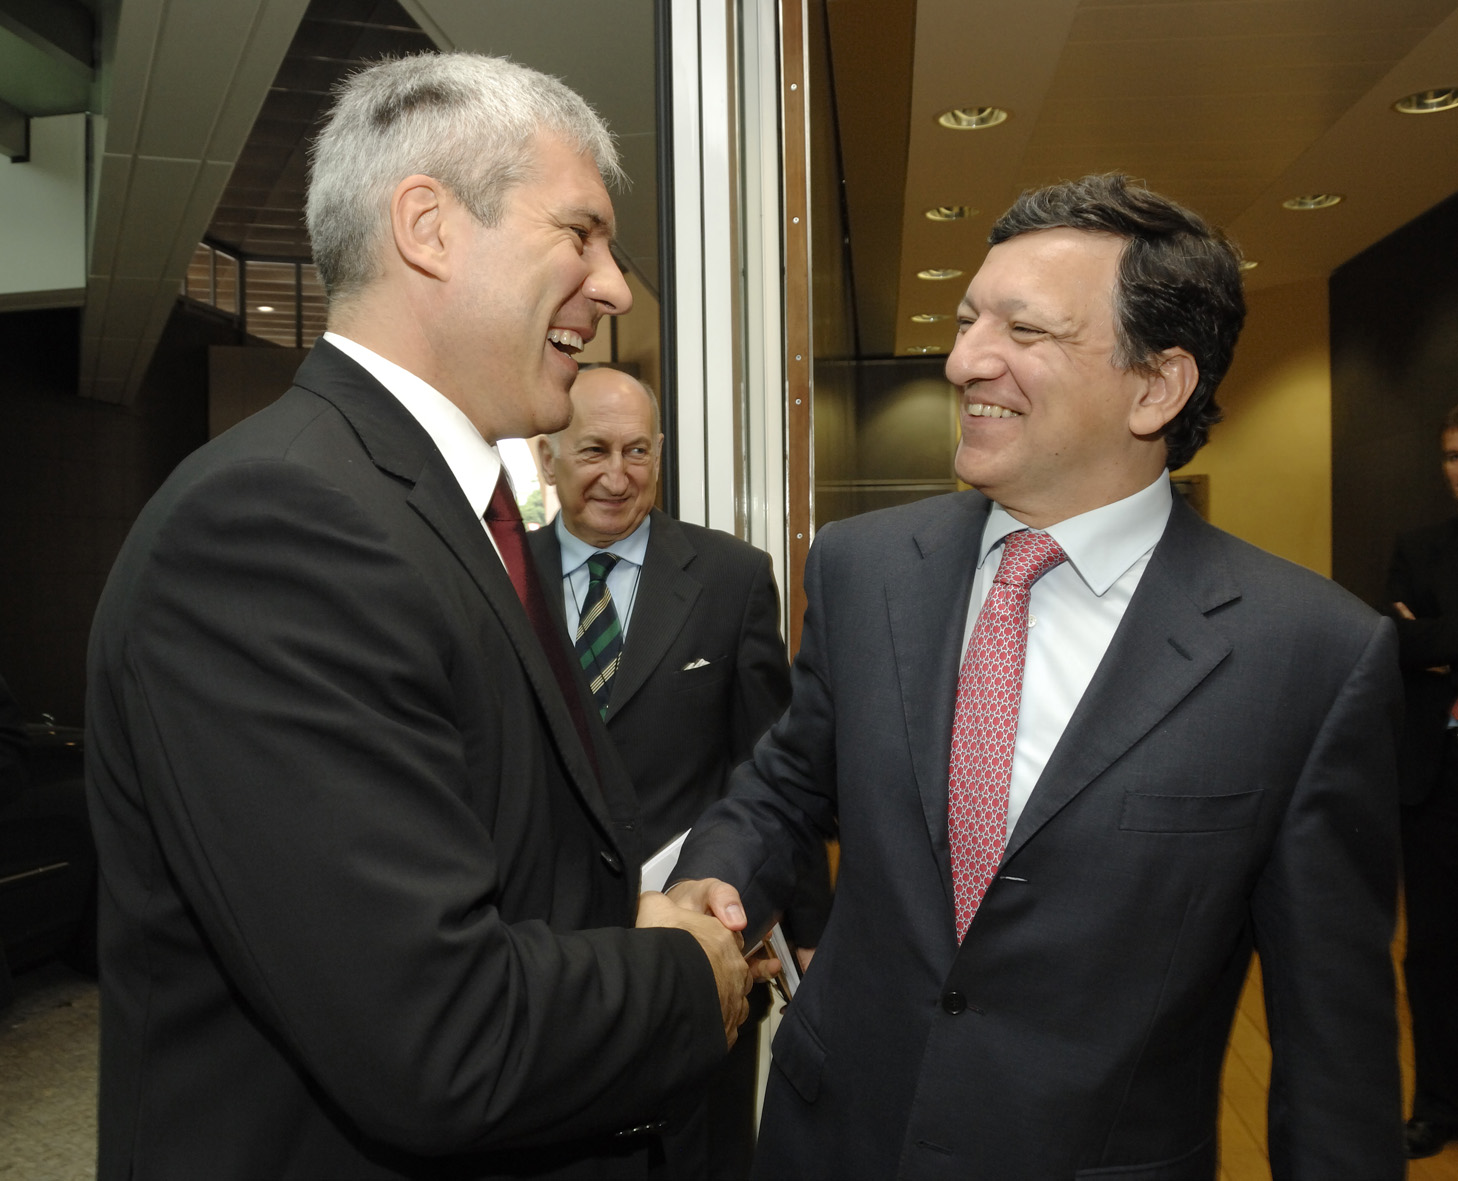 Visit by Boris Tadić, President of Serbia, to the EC